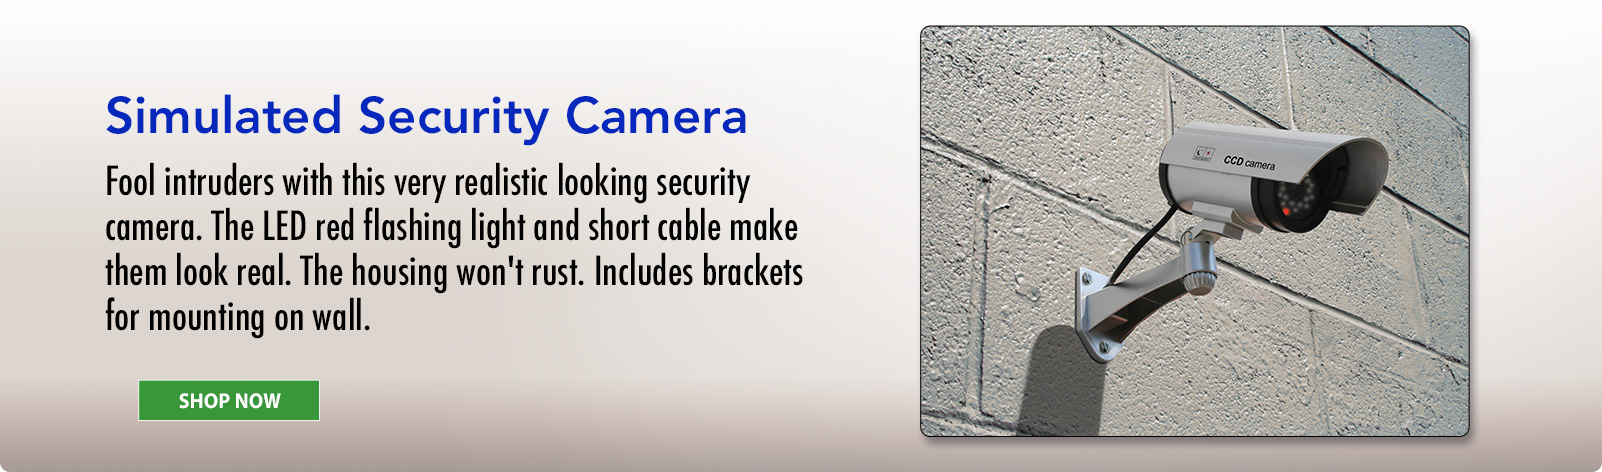 Simulated Security Camera